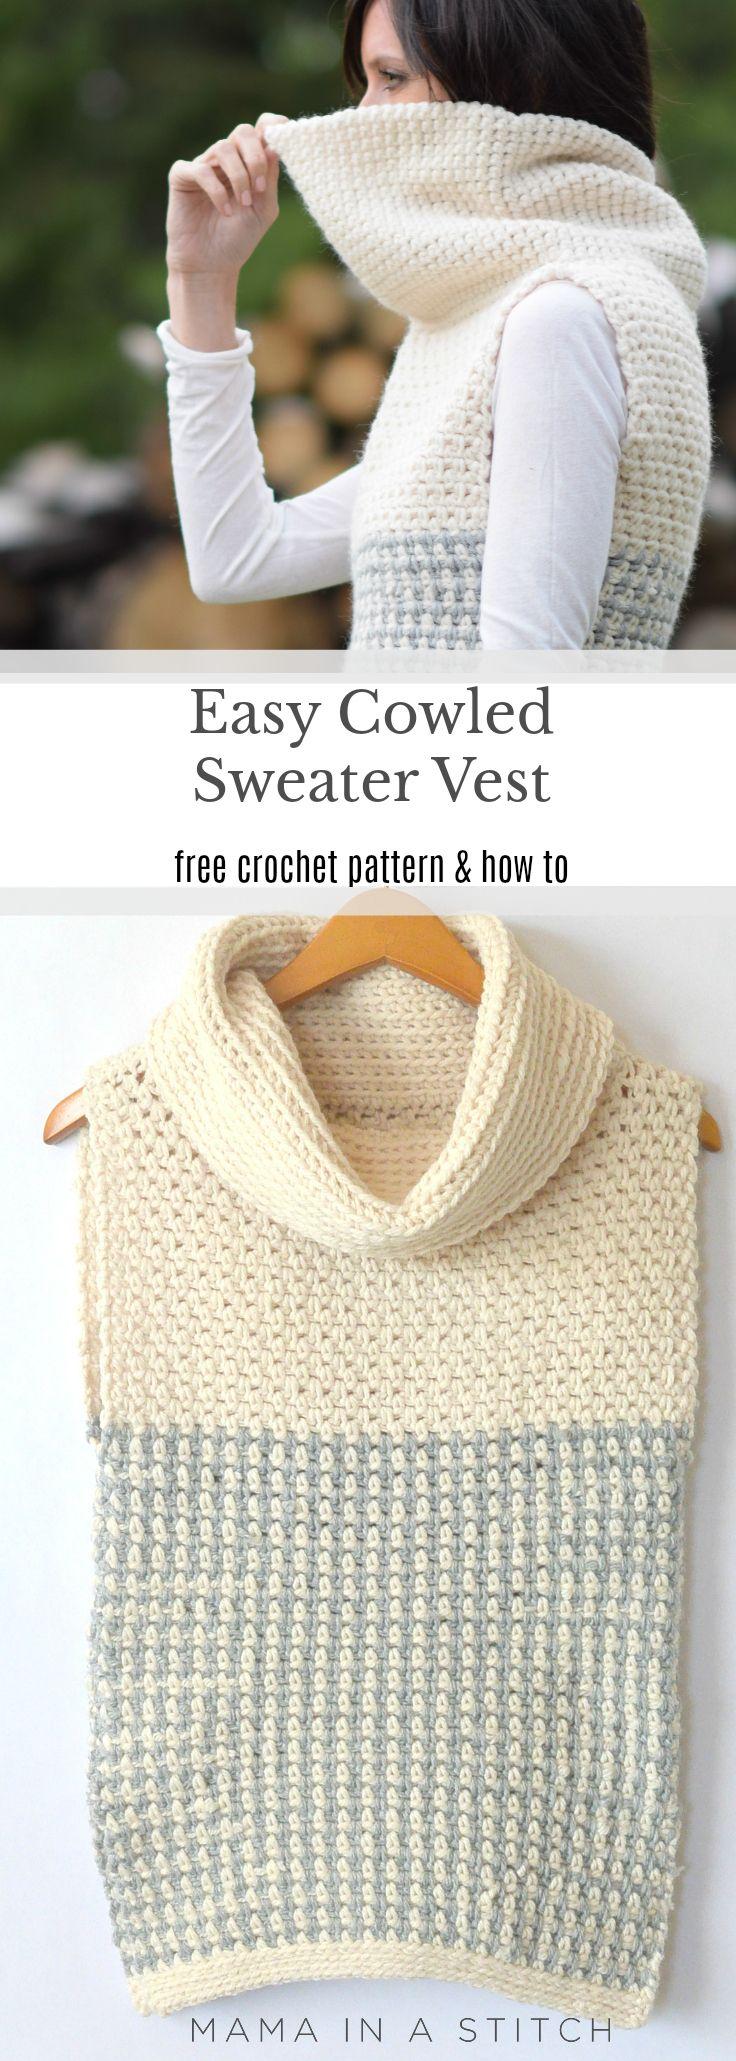 Easy Crochet Cowled Sweater Vest | Vests | Pinterest | Tejido ...